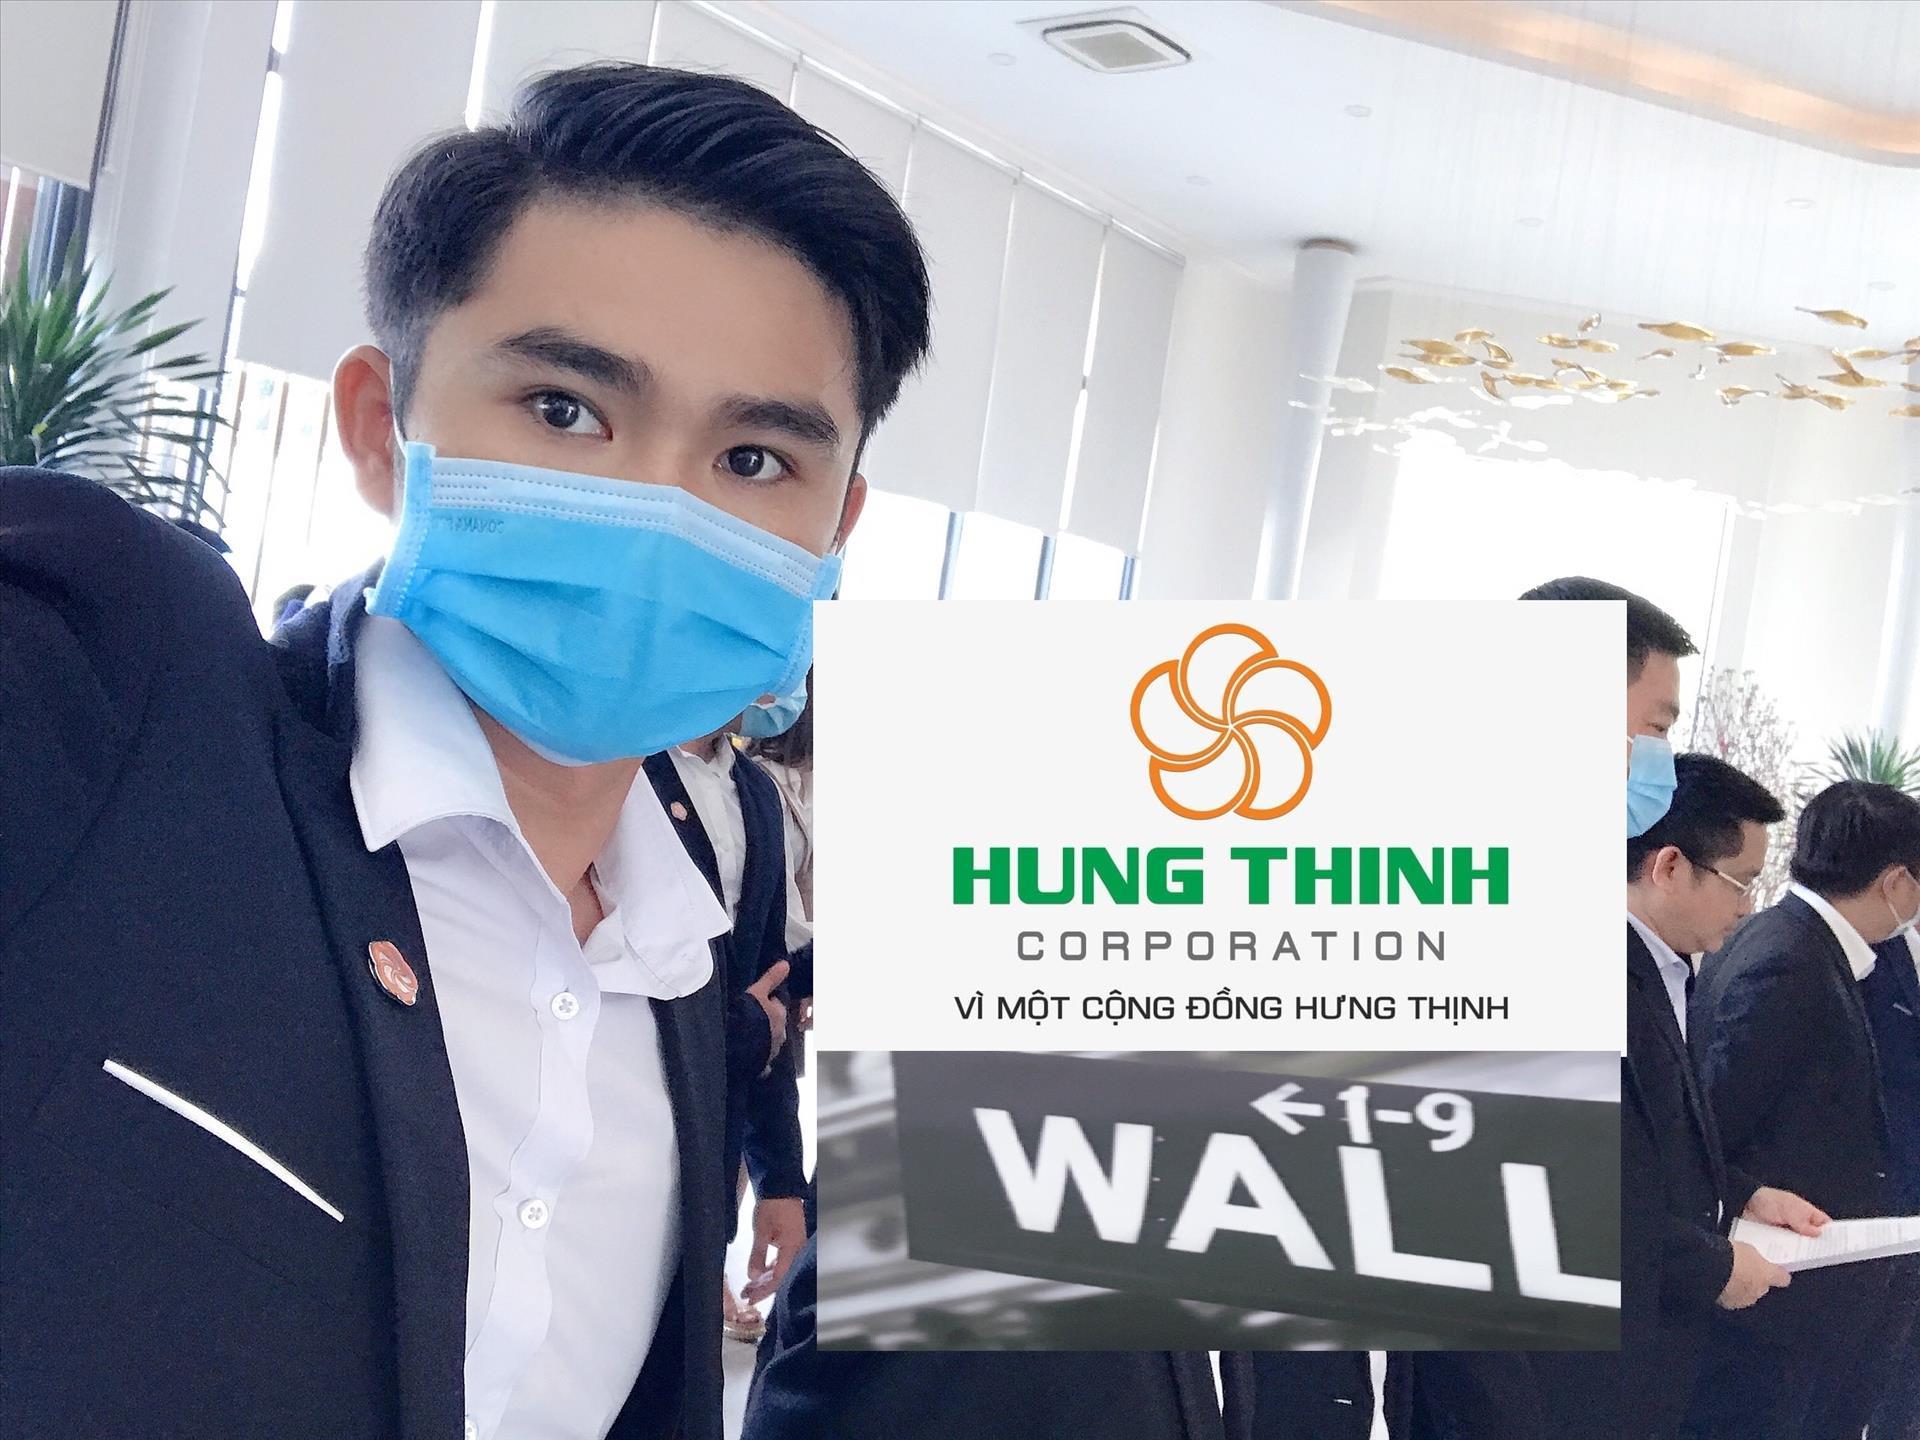 Mai Thanh Quang